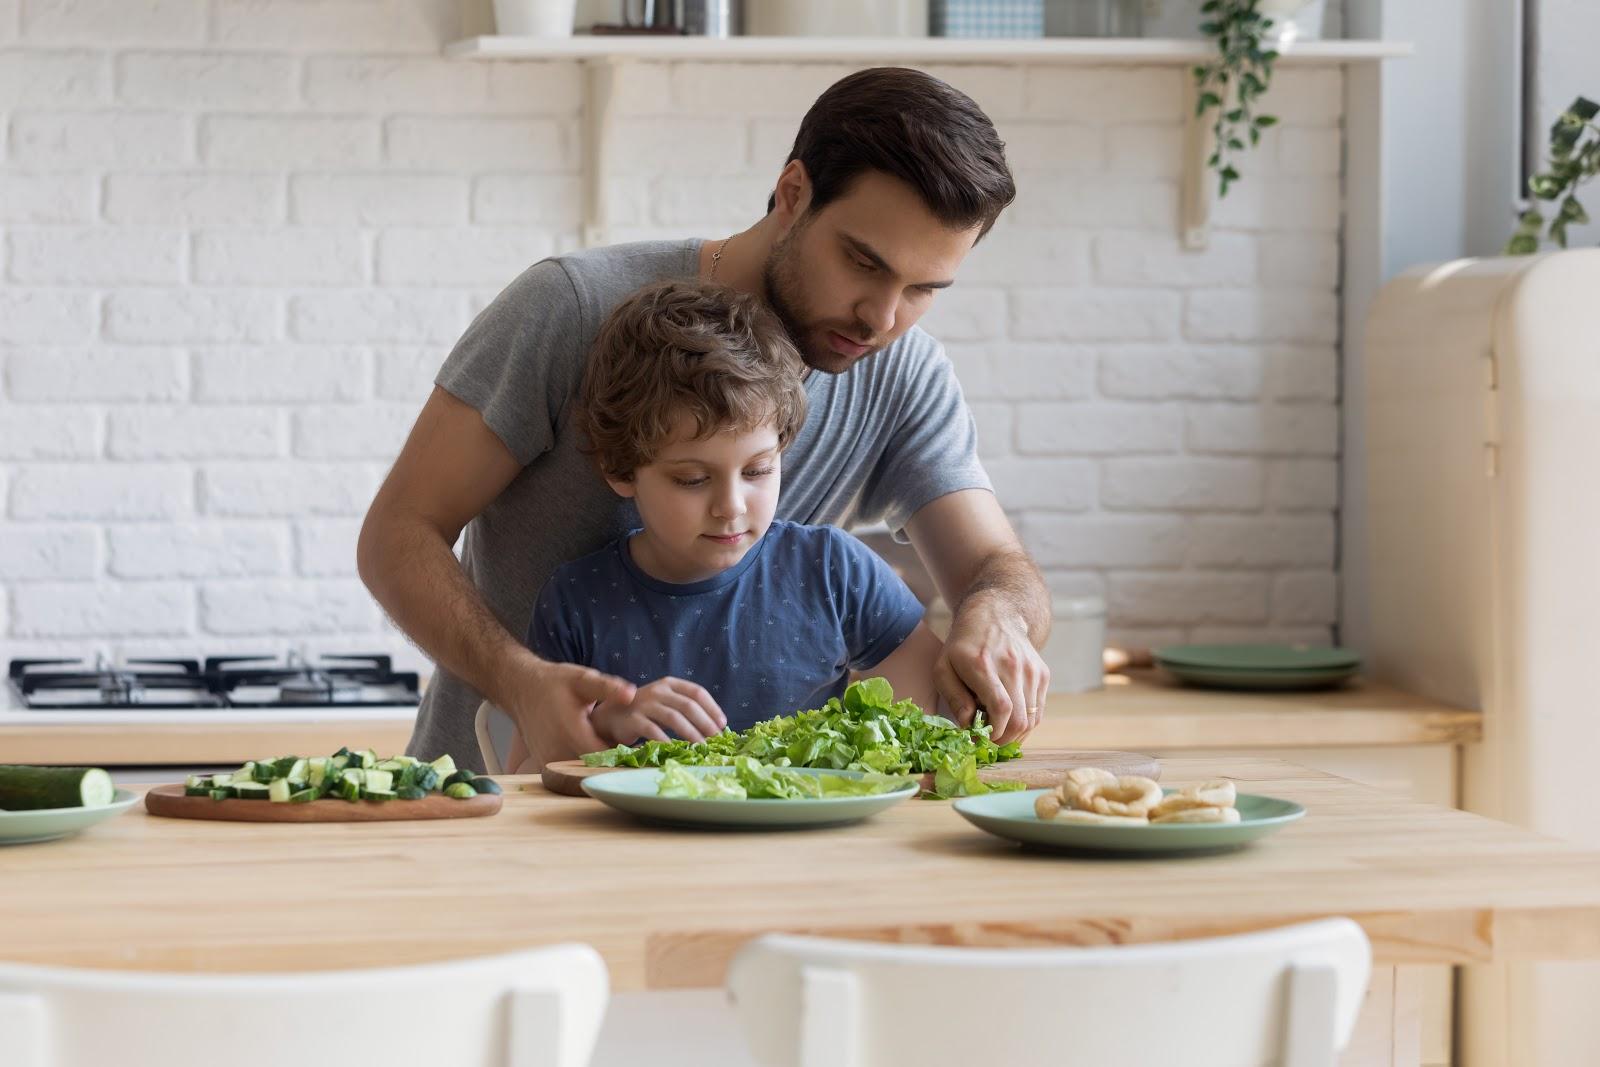 pai e filho cortando alimento